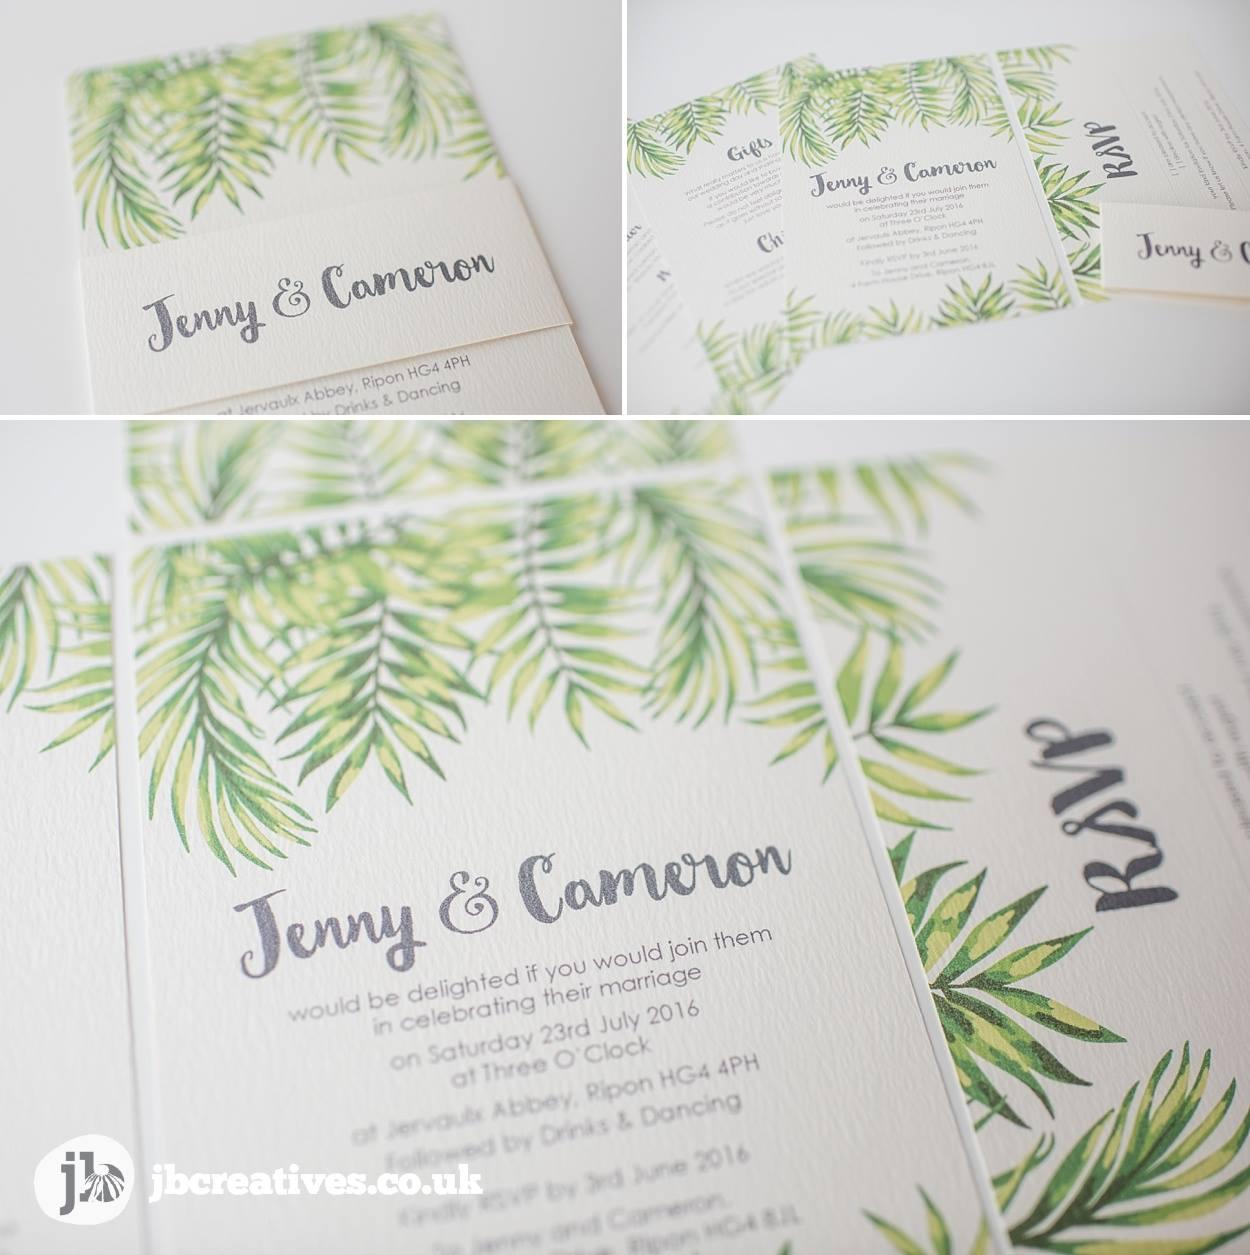 jb-creatives-hand-made-bespoke-wedding-stationery-and-wedding-invites04